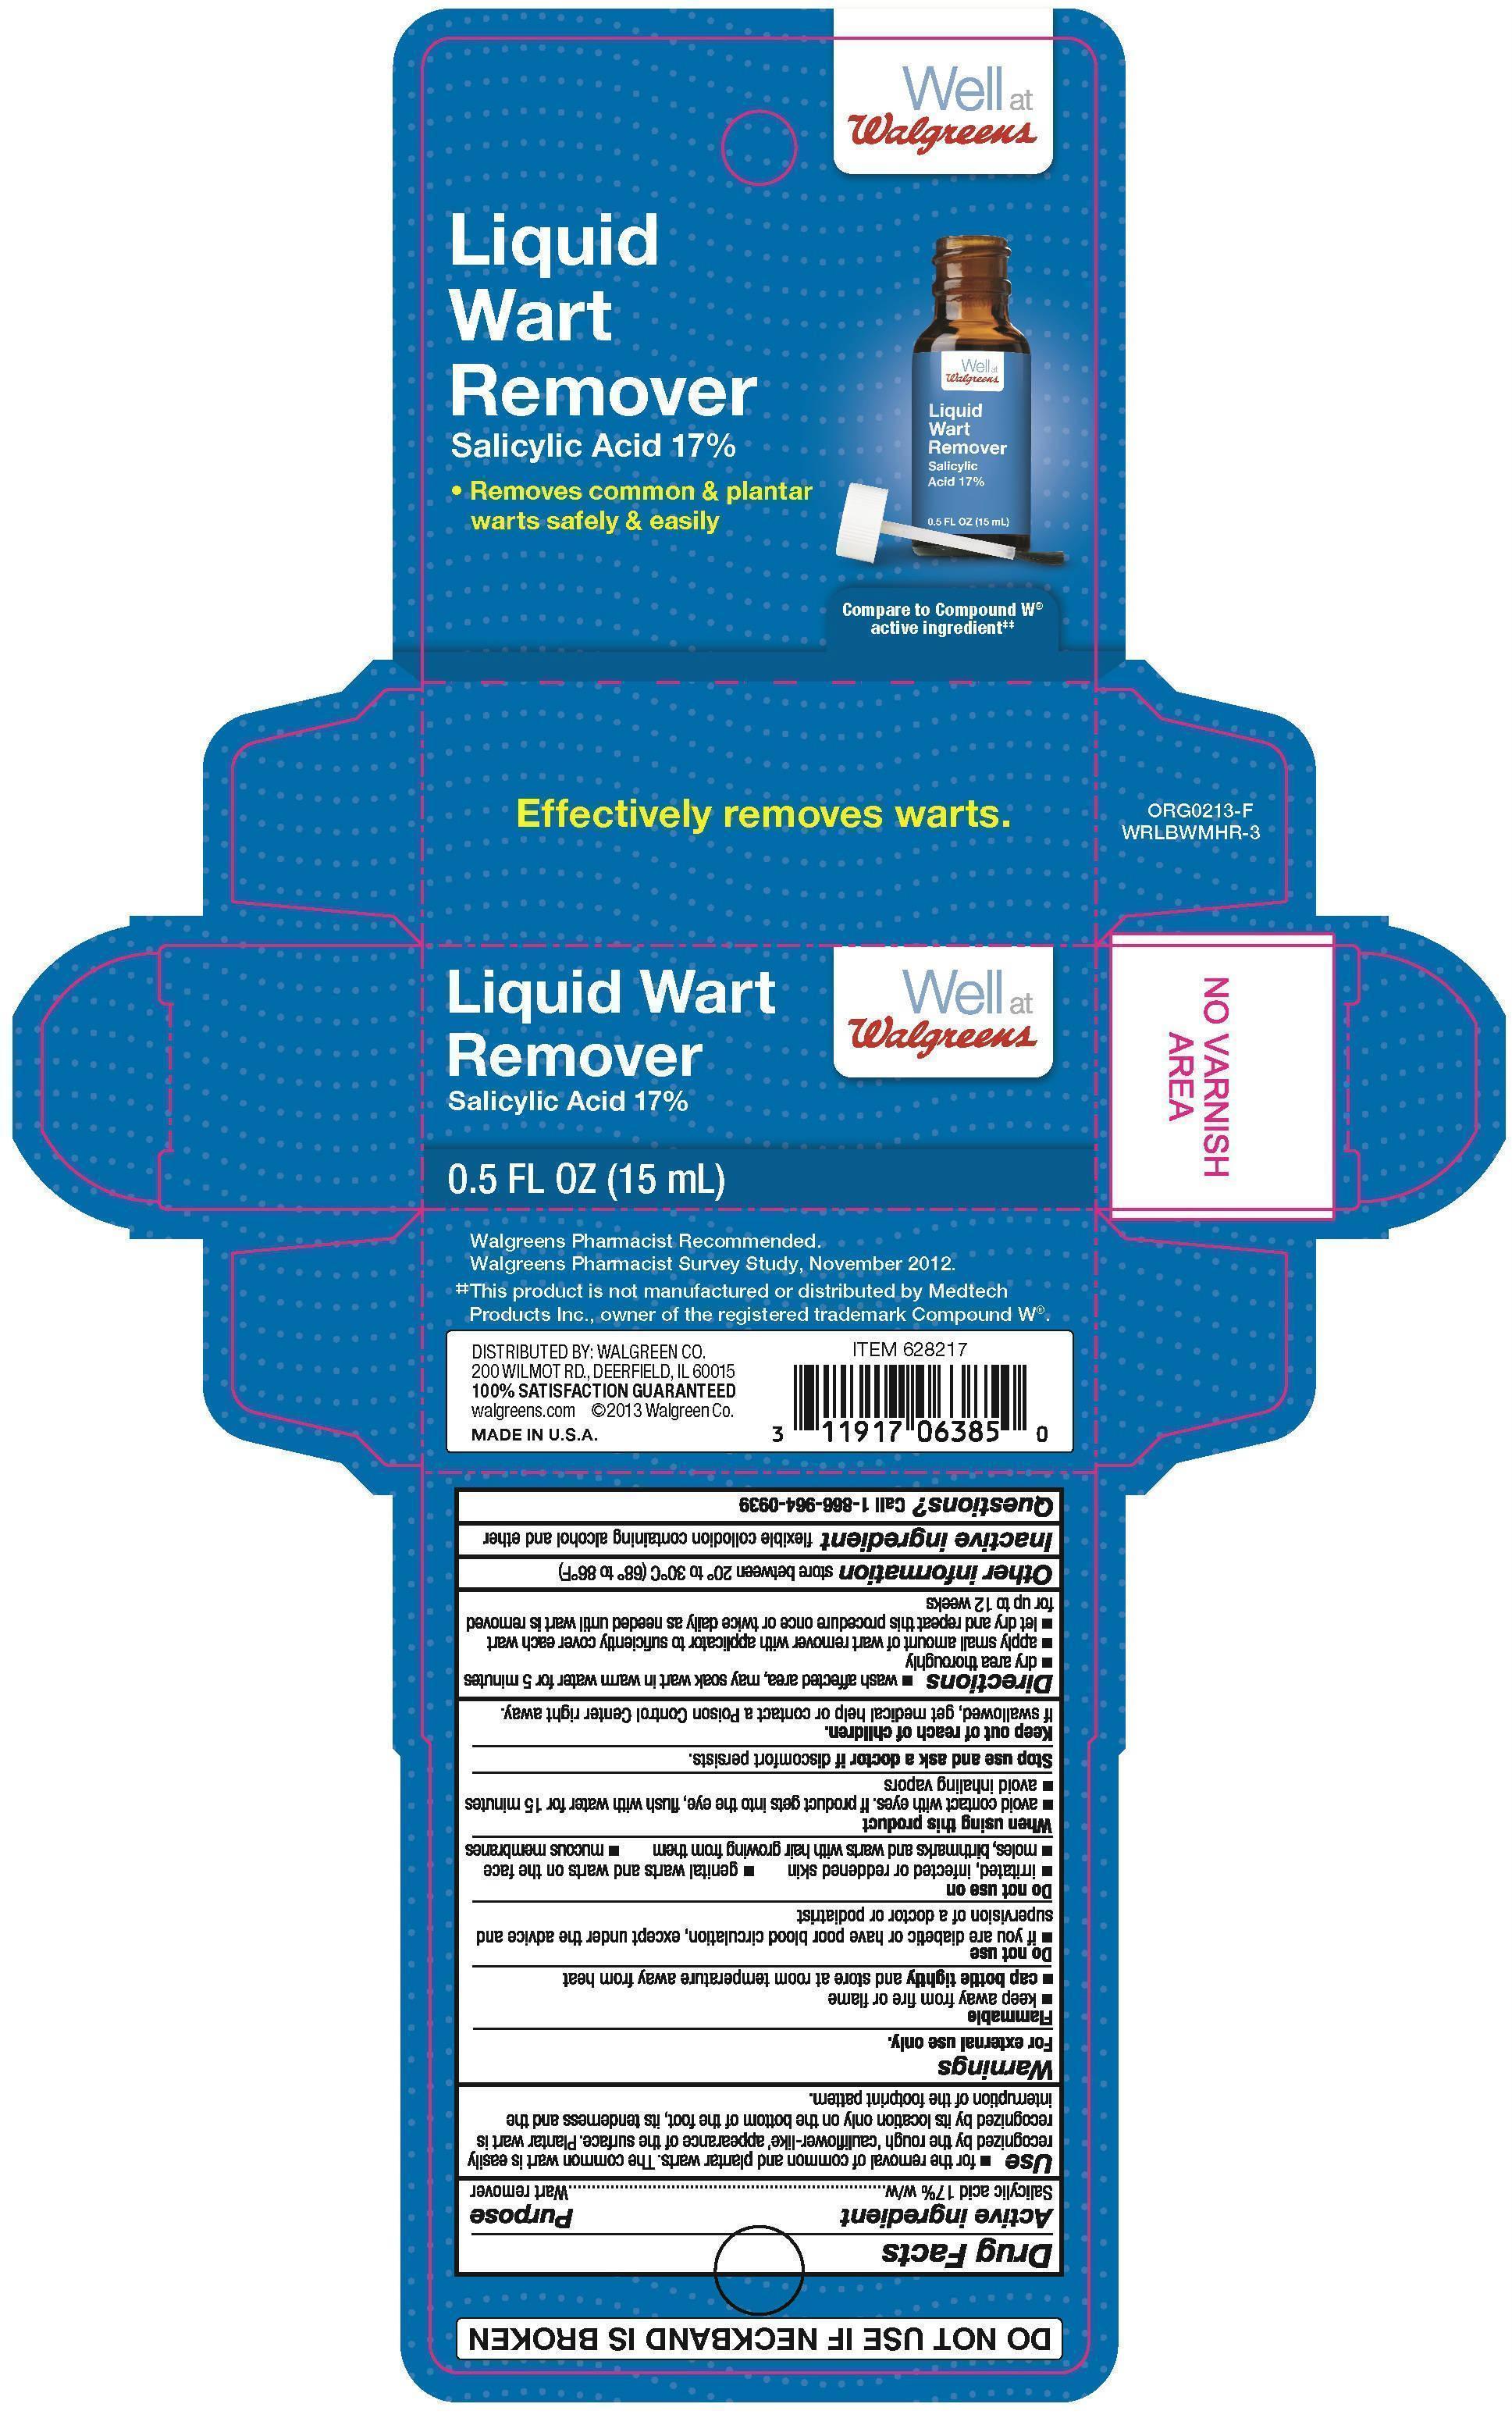 Well at Liq Wart Remover BOX.jpg